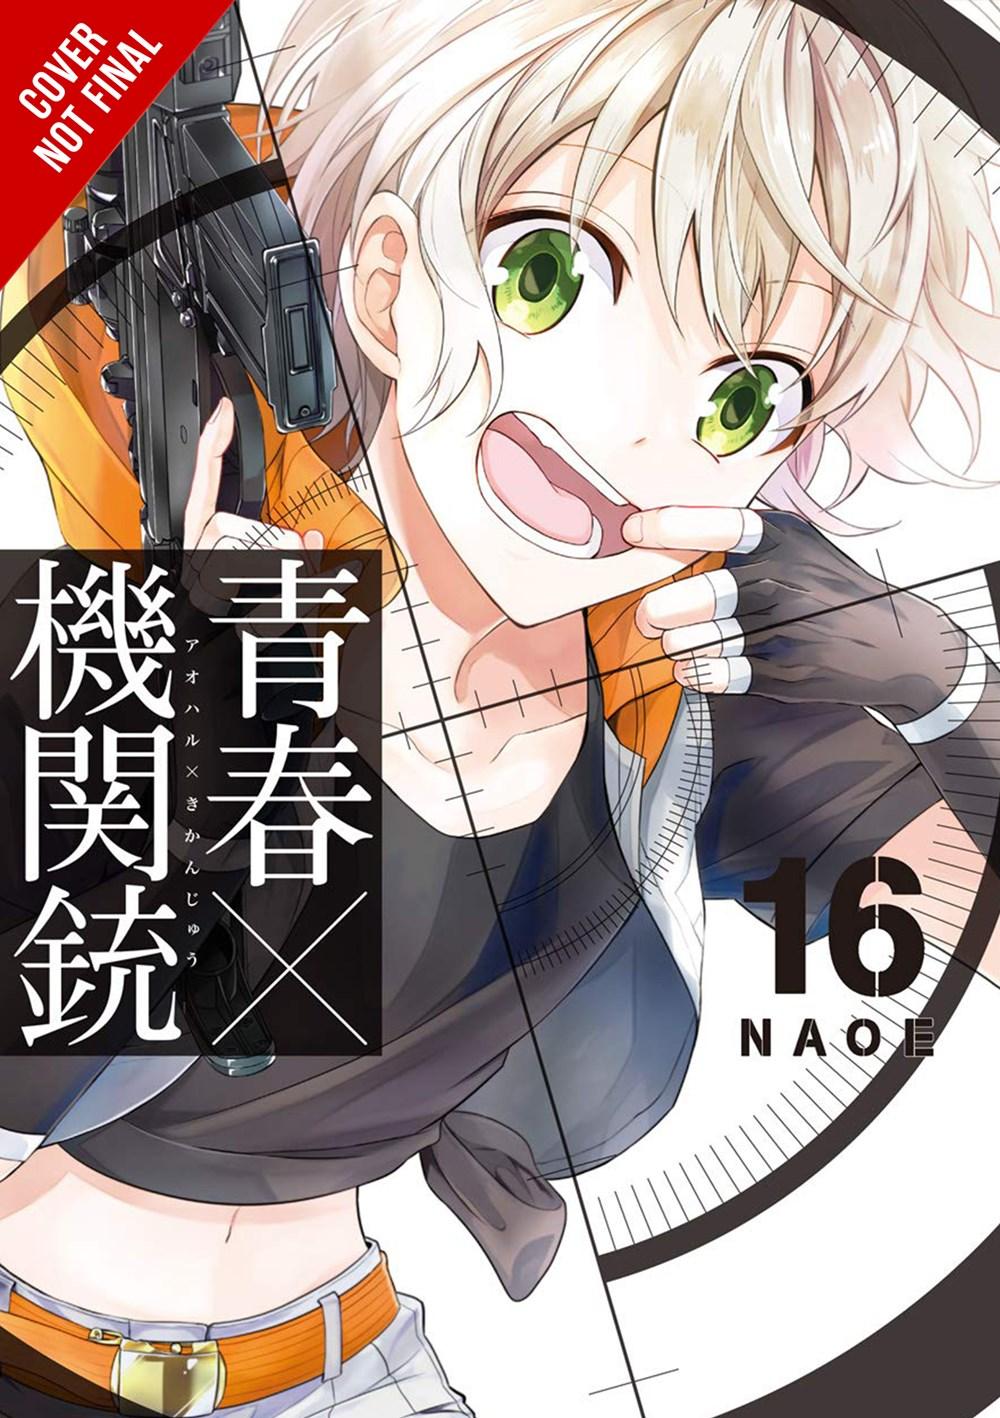 Aoharu X Machinegun Manga Volume 16